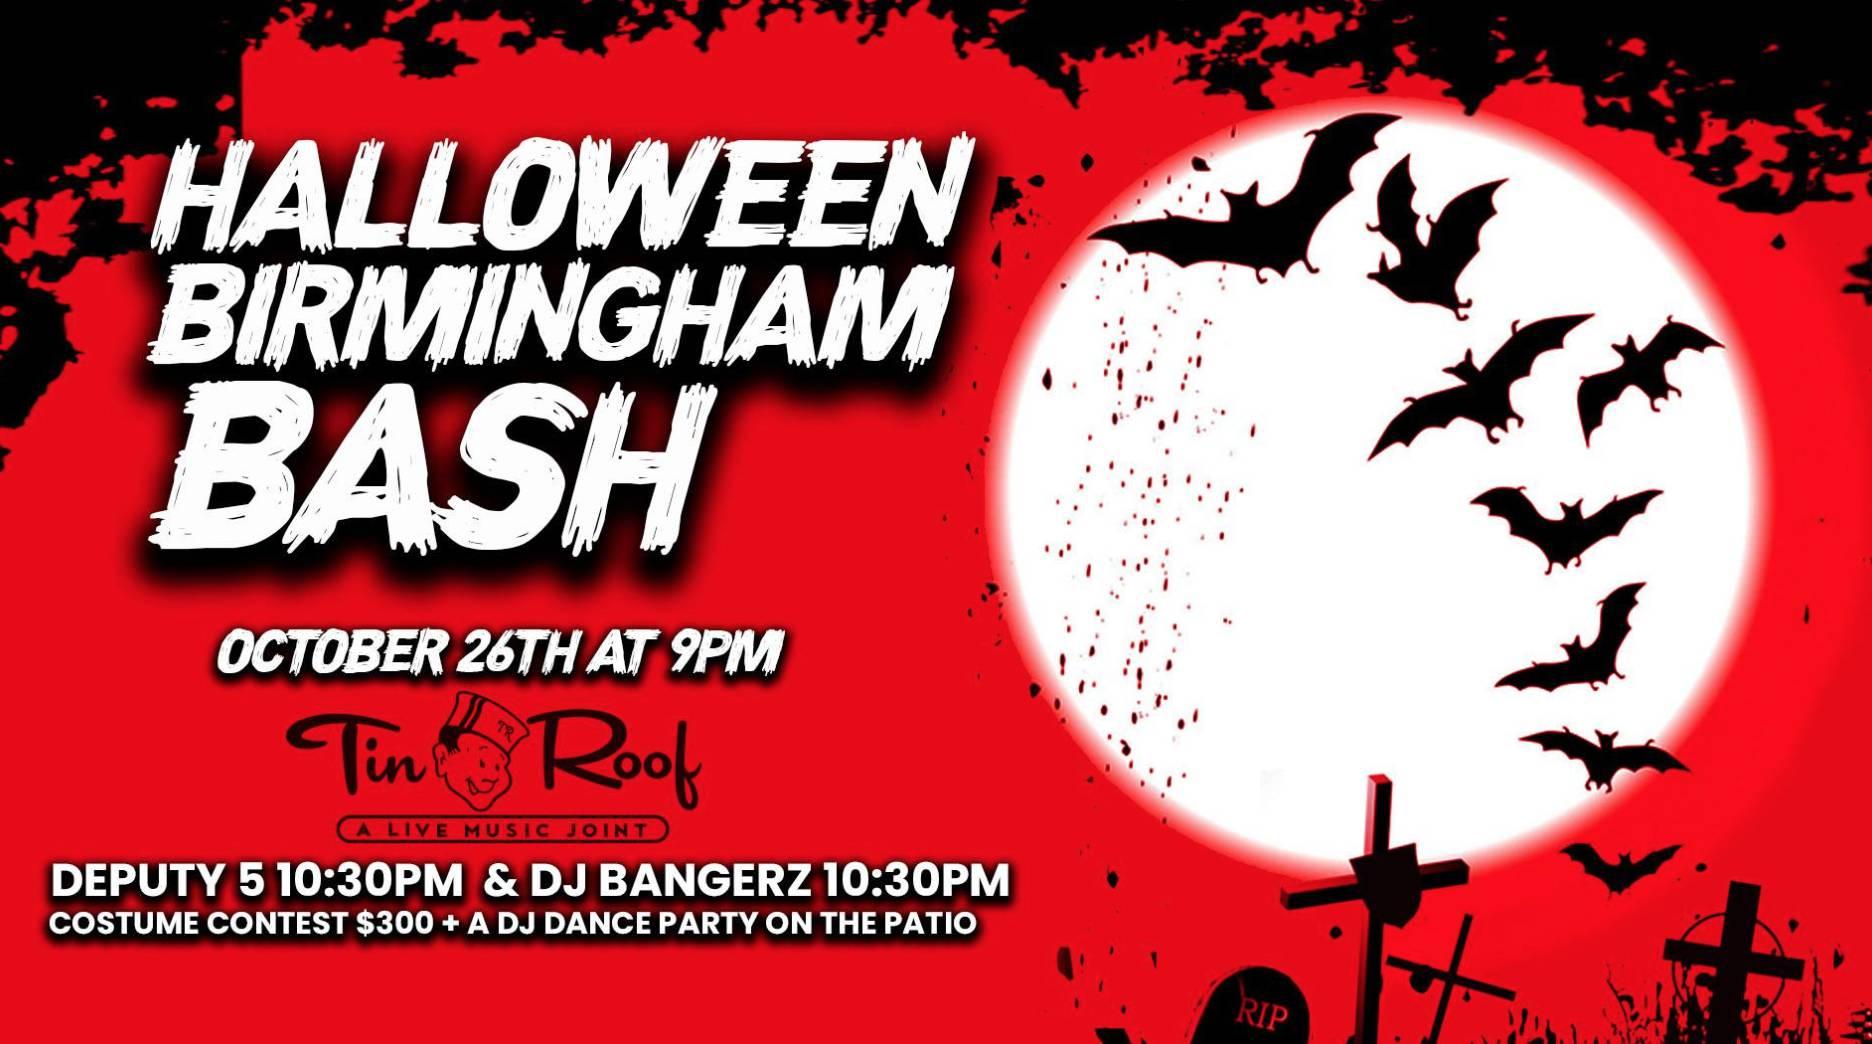 Halloween Birmingham Bash!